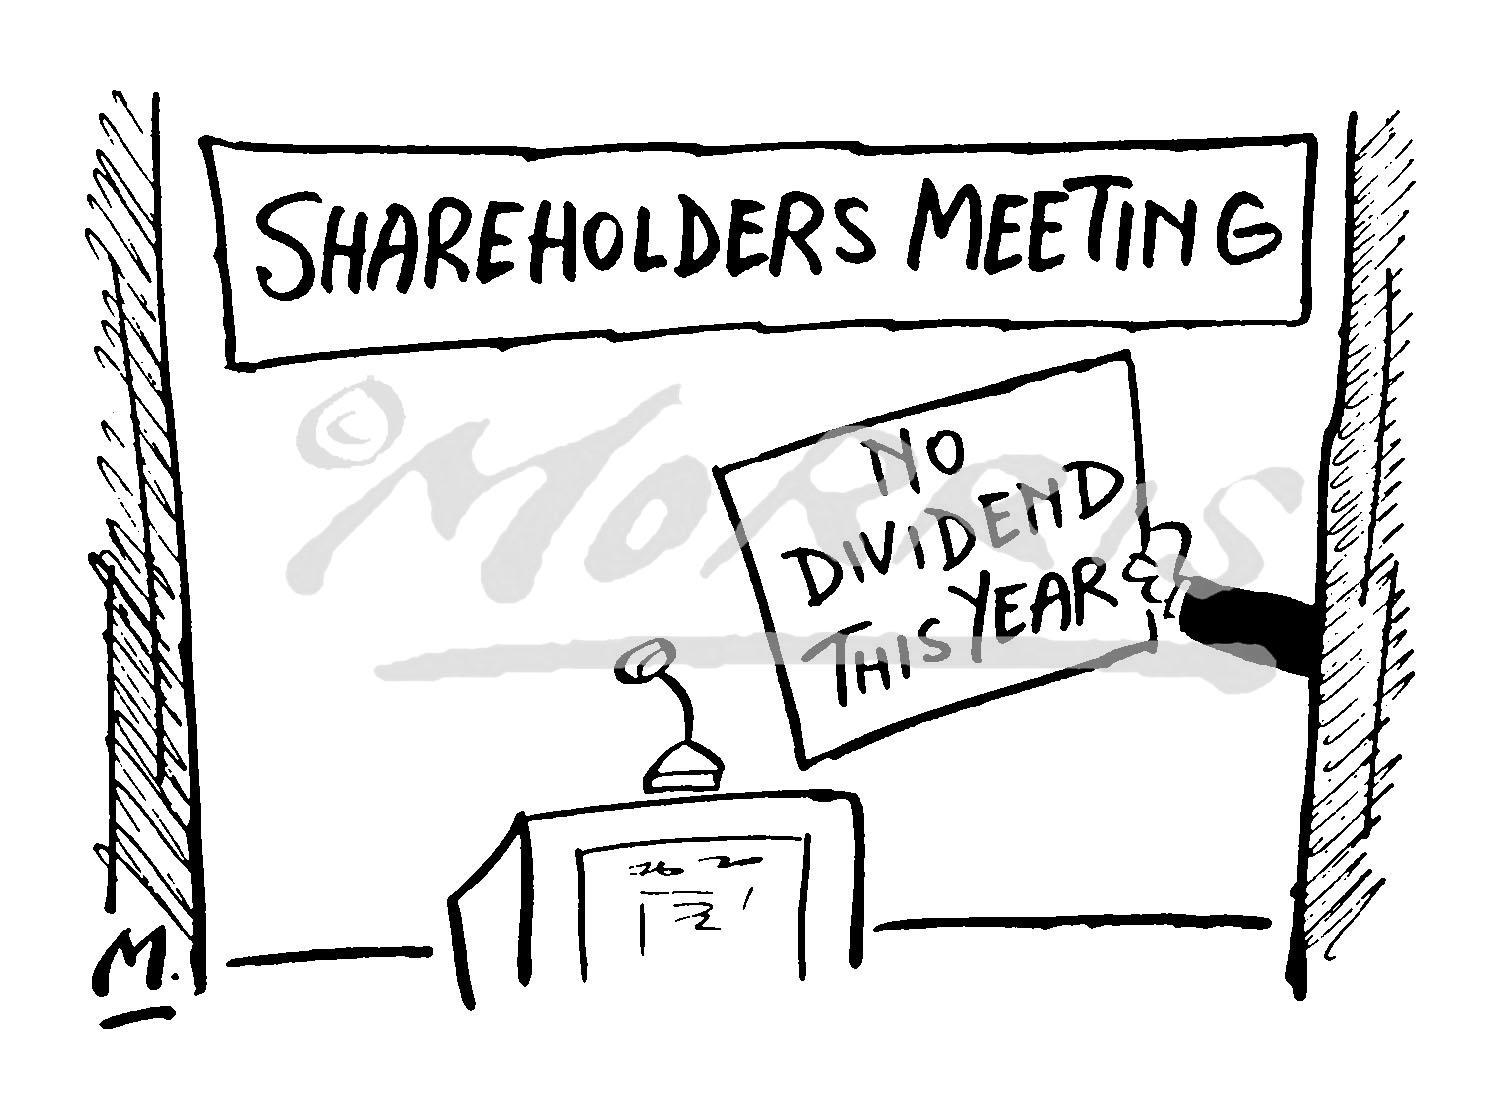 Shareholders cartoon – Ref: 4185bw